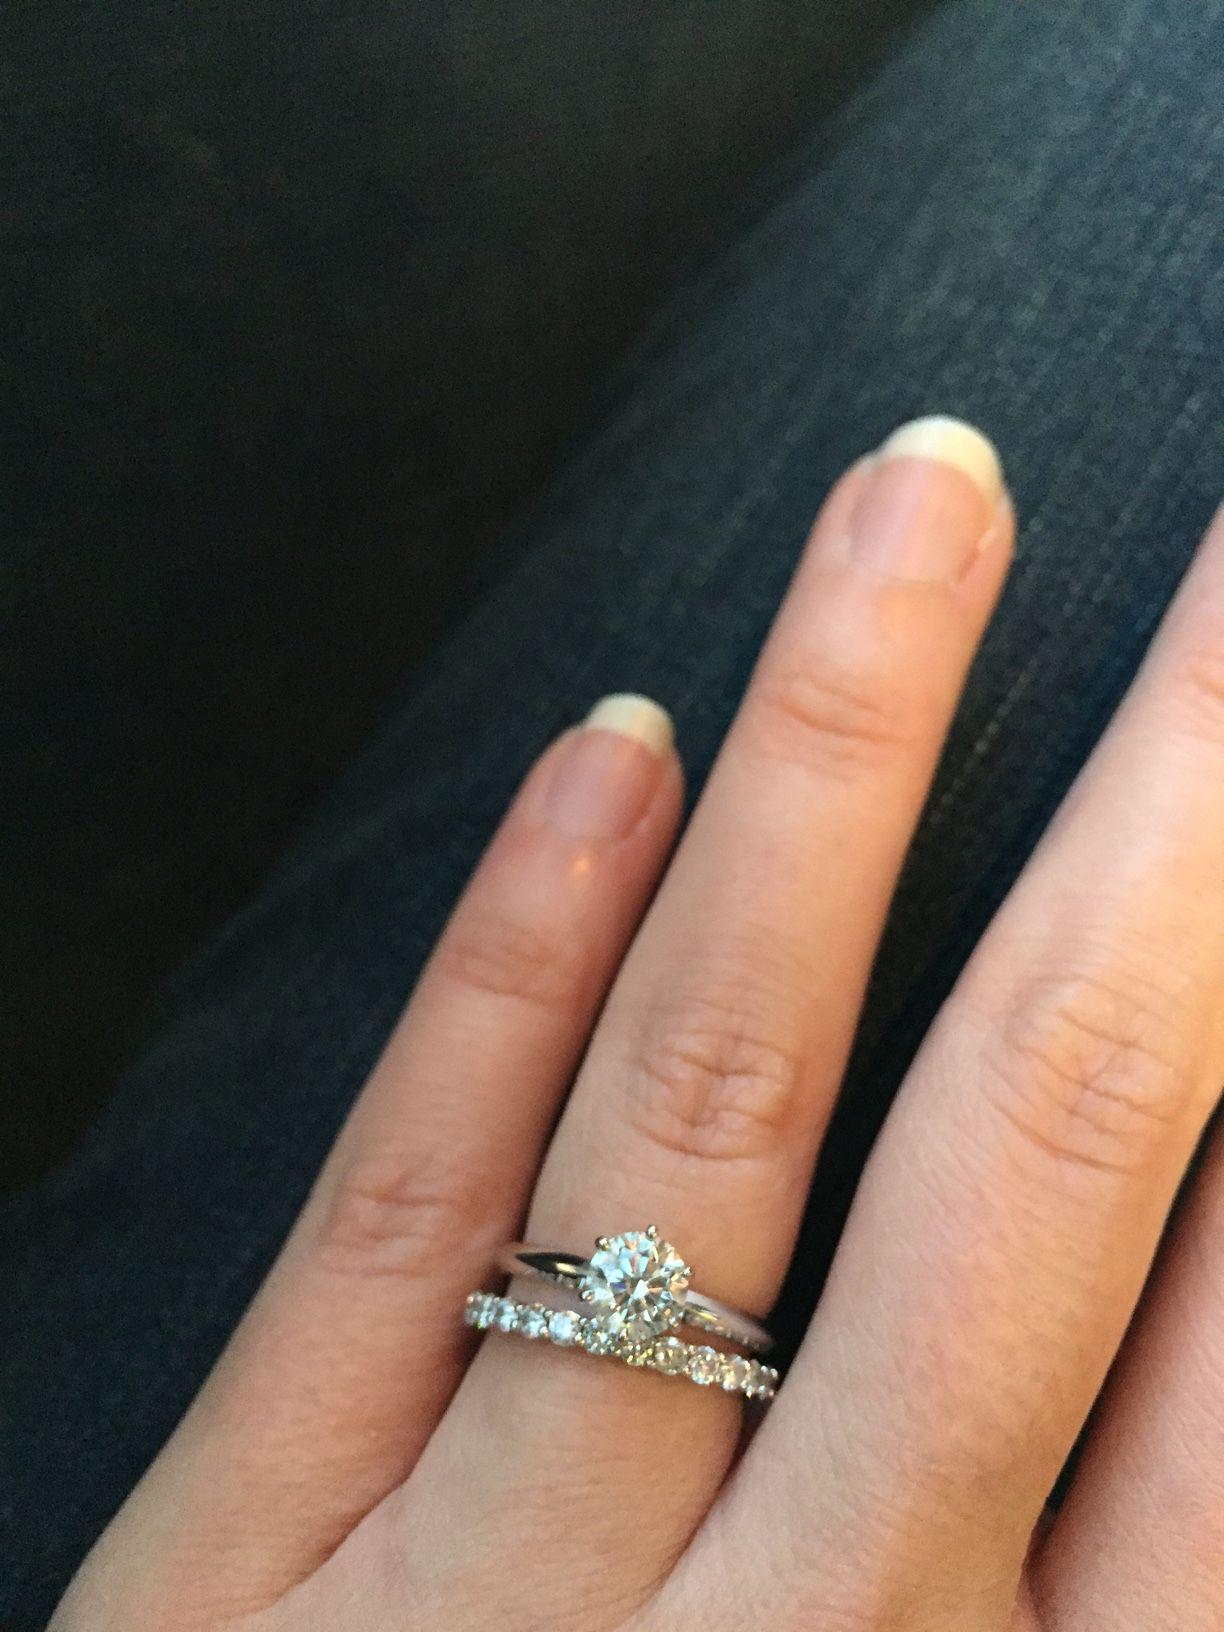 Unique Weddingbee White Gold Ring